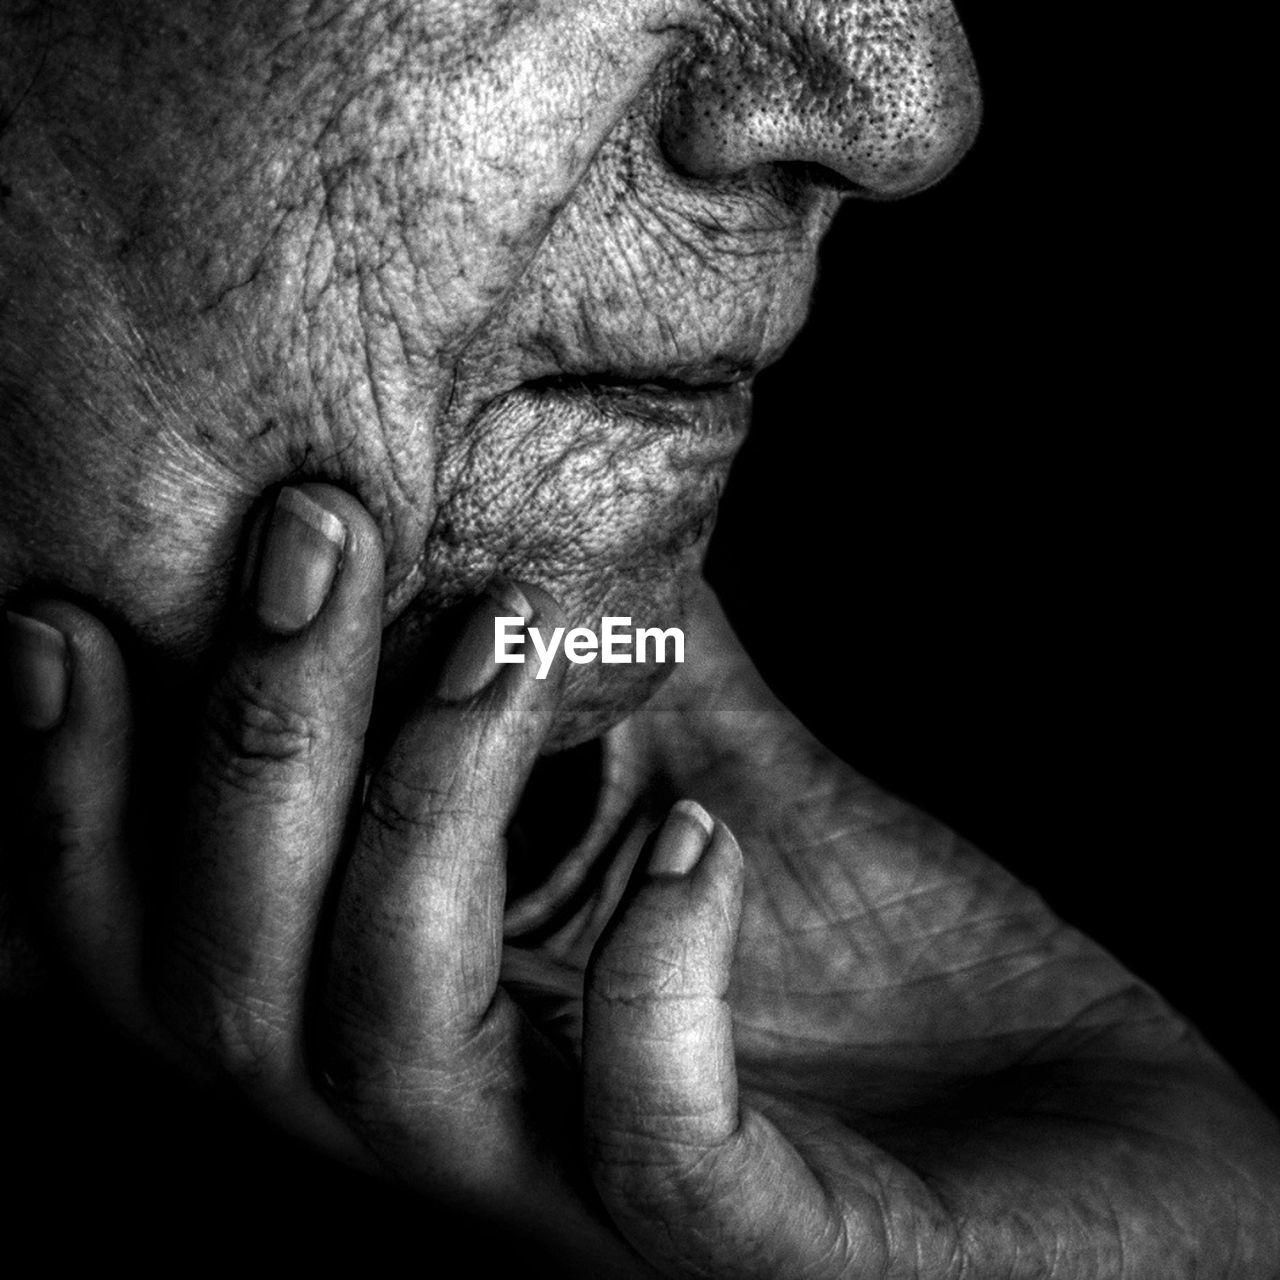 senior adult, human body part, wrinkled, senior men, human hand, one person, senior women, real people, black background, human skin, touching, close-up, men, bonding, eyesight, adult, adults only, people